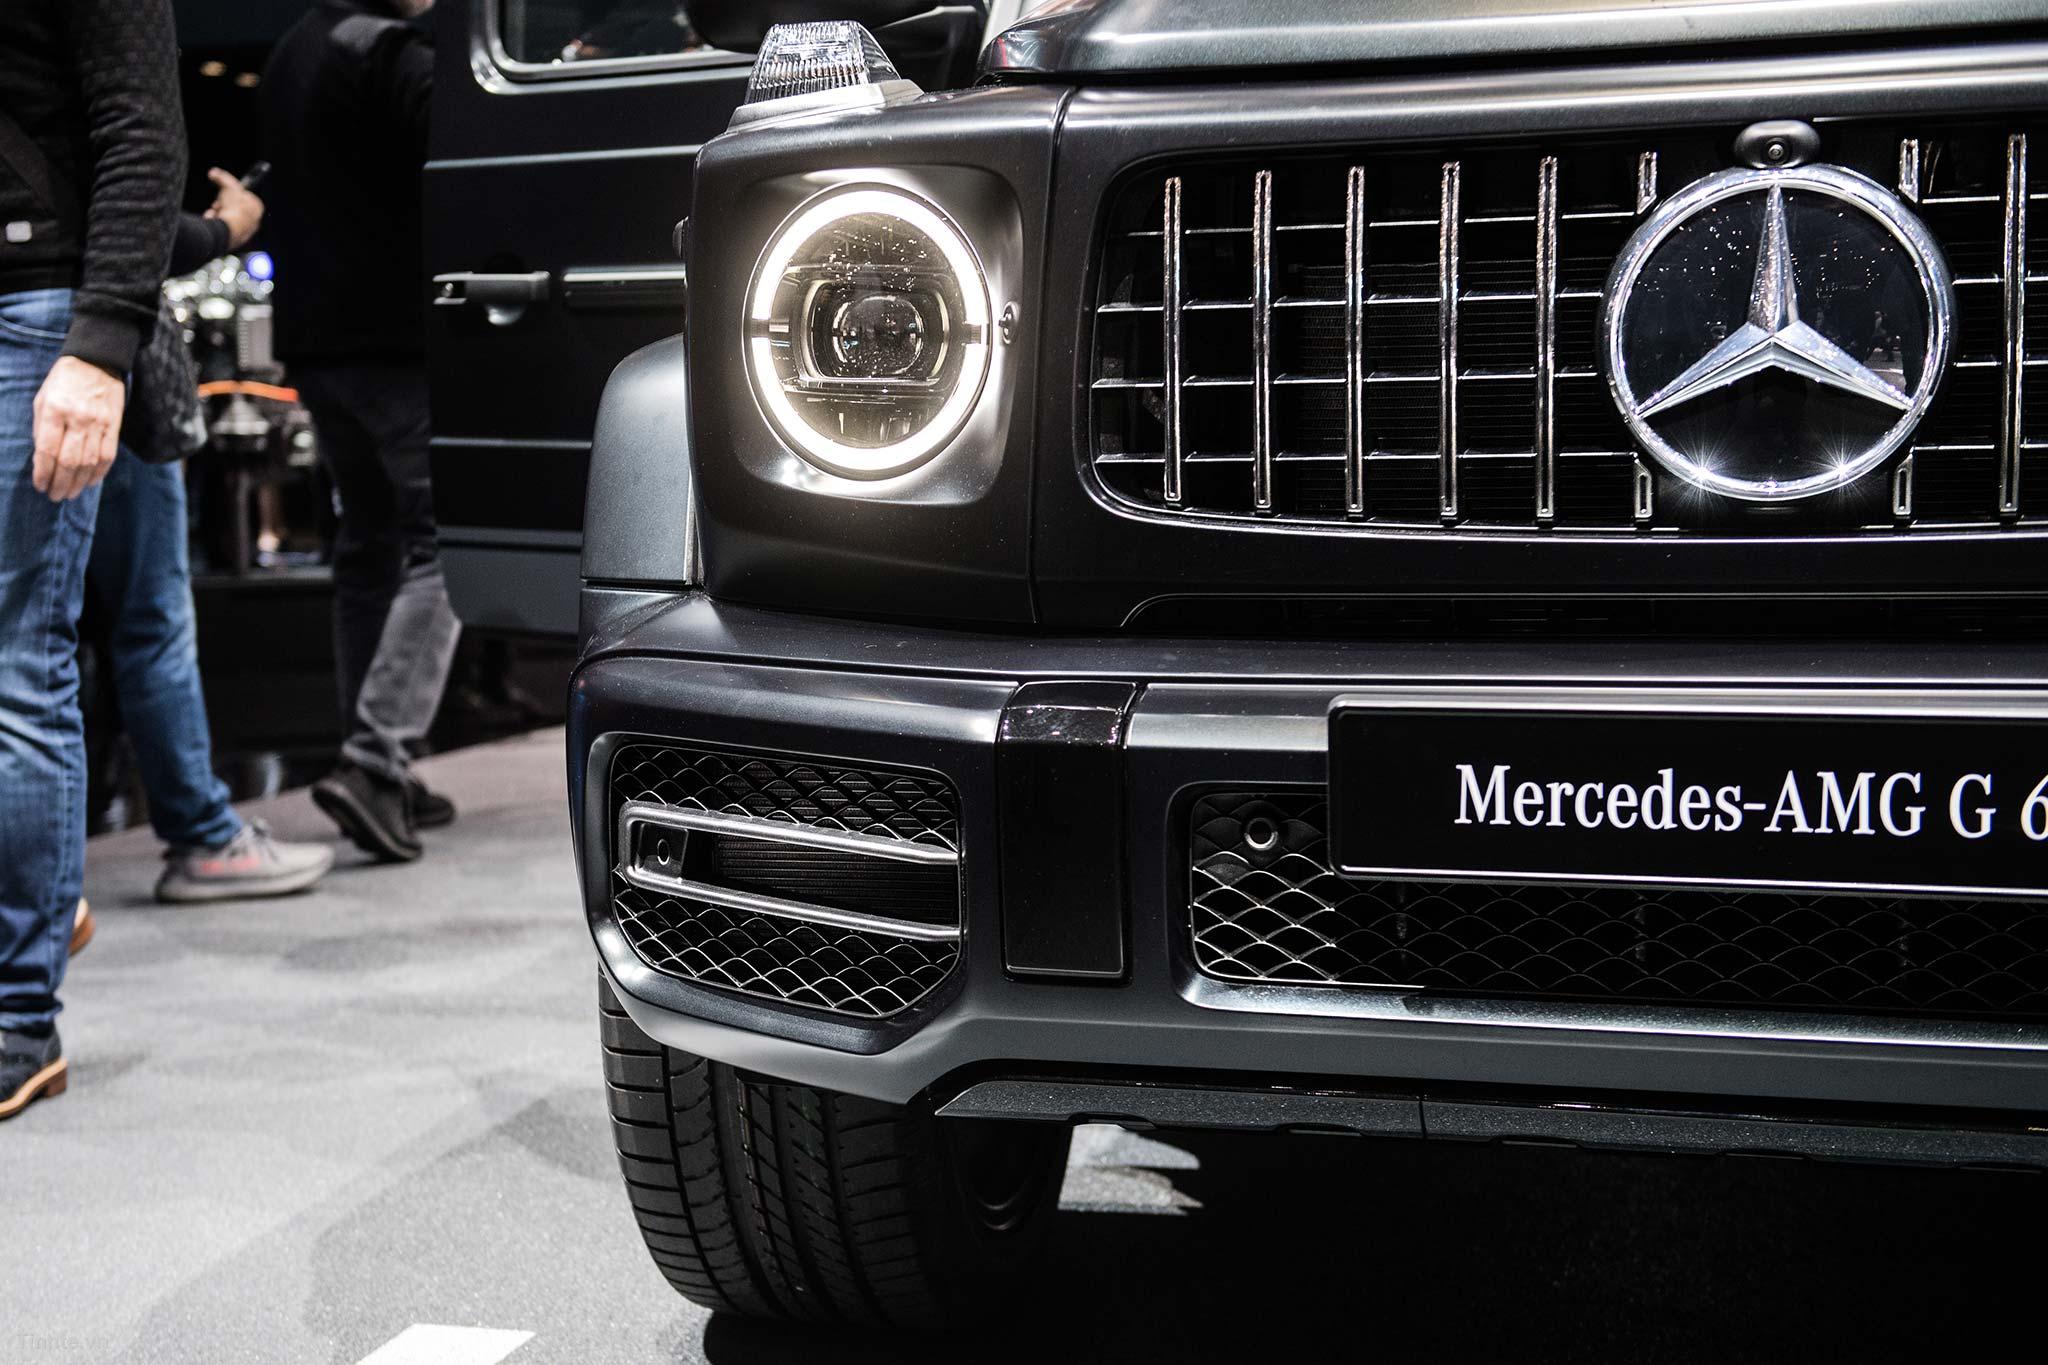 tinhte_Mercedes-AMG-G-63-4.jpg